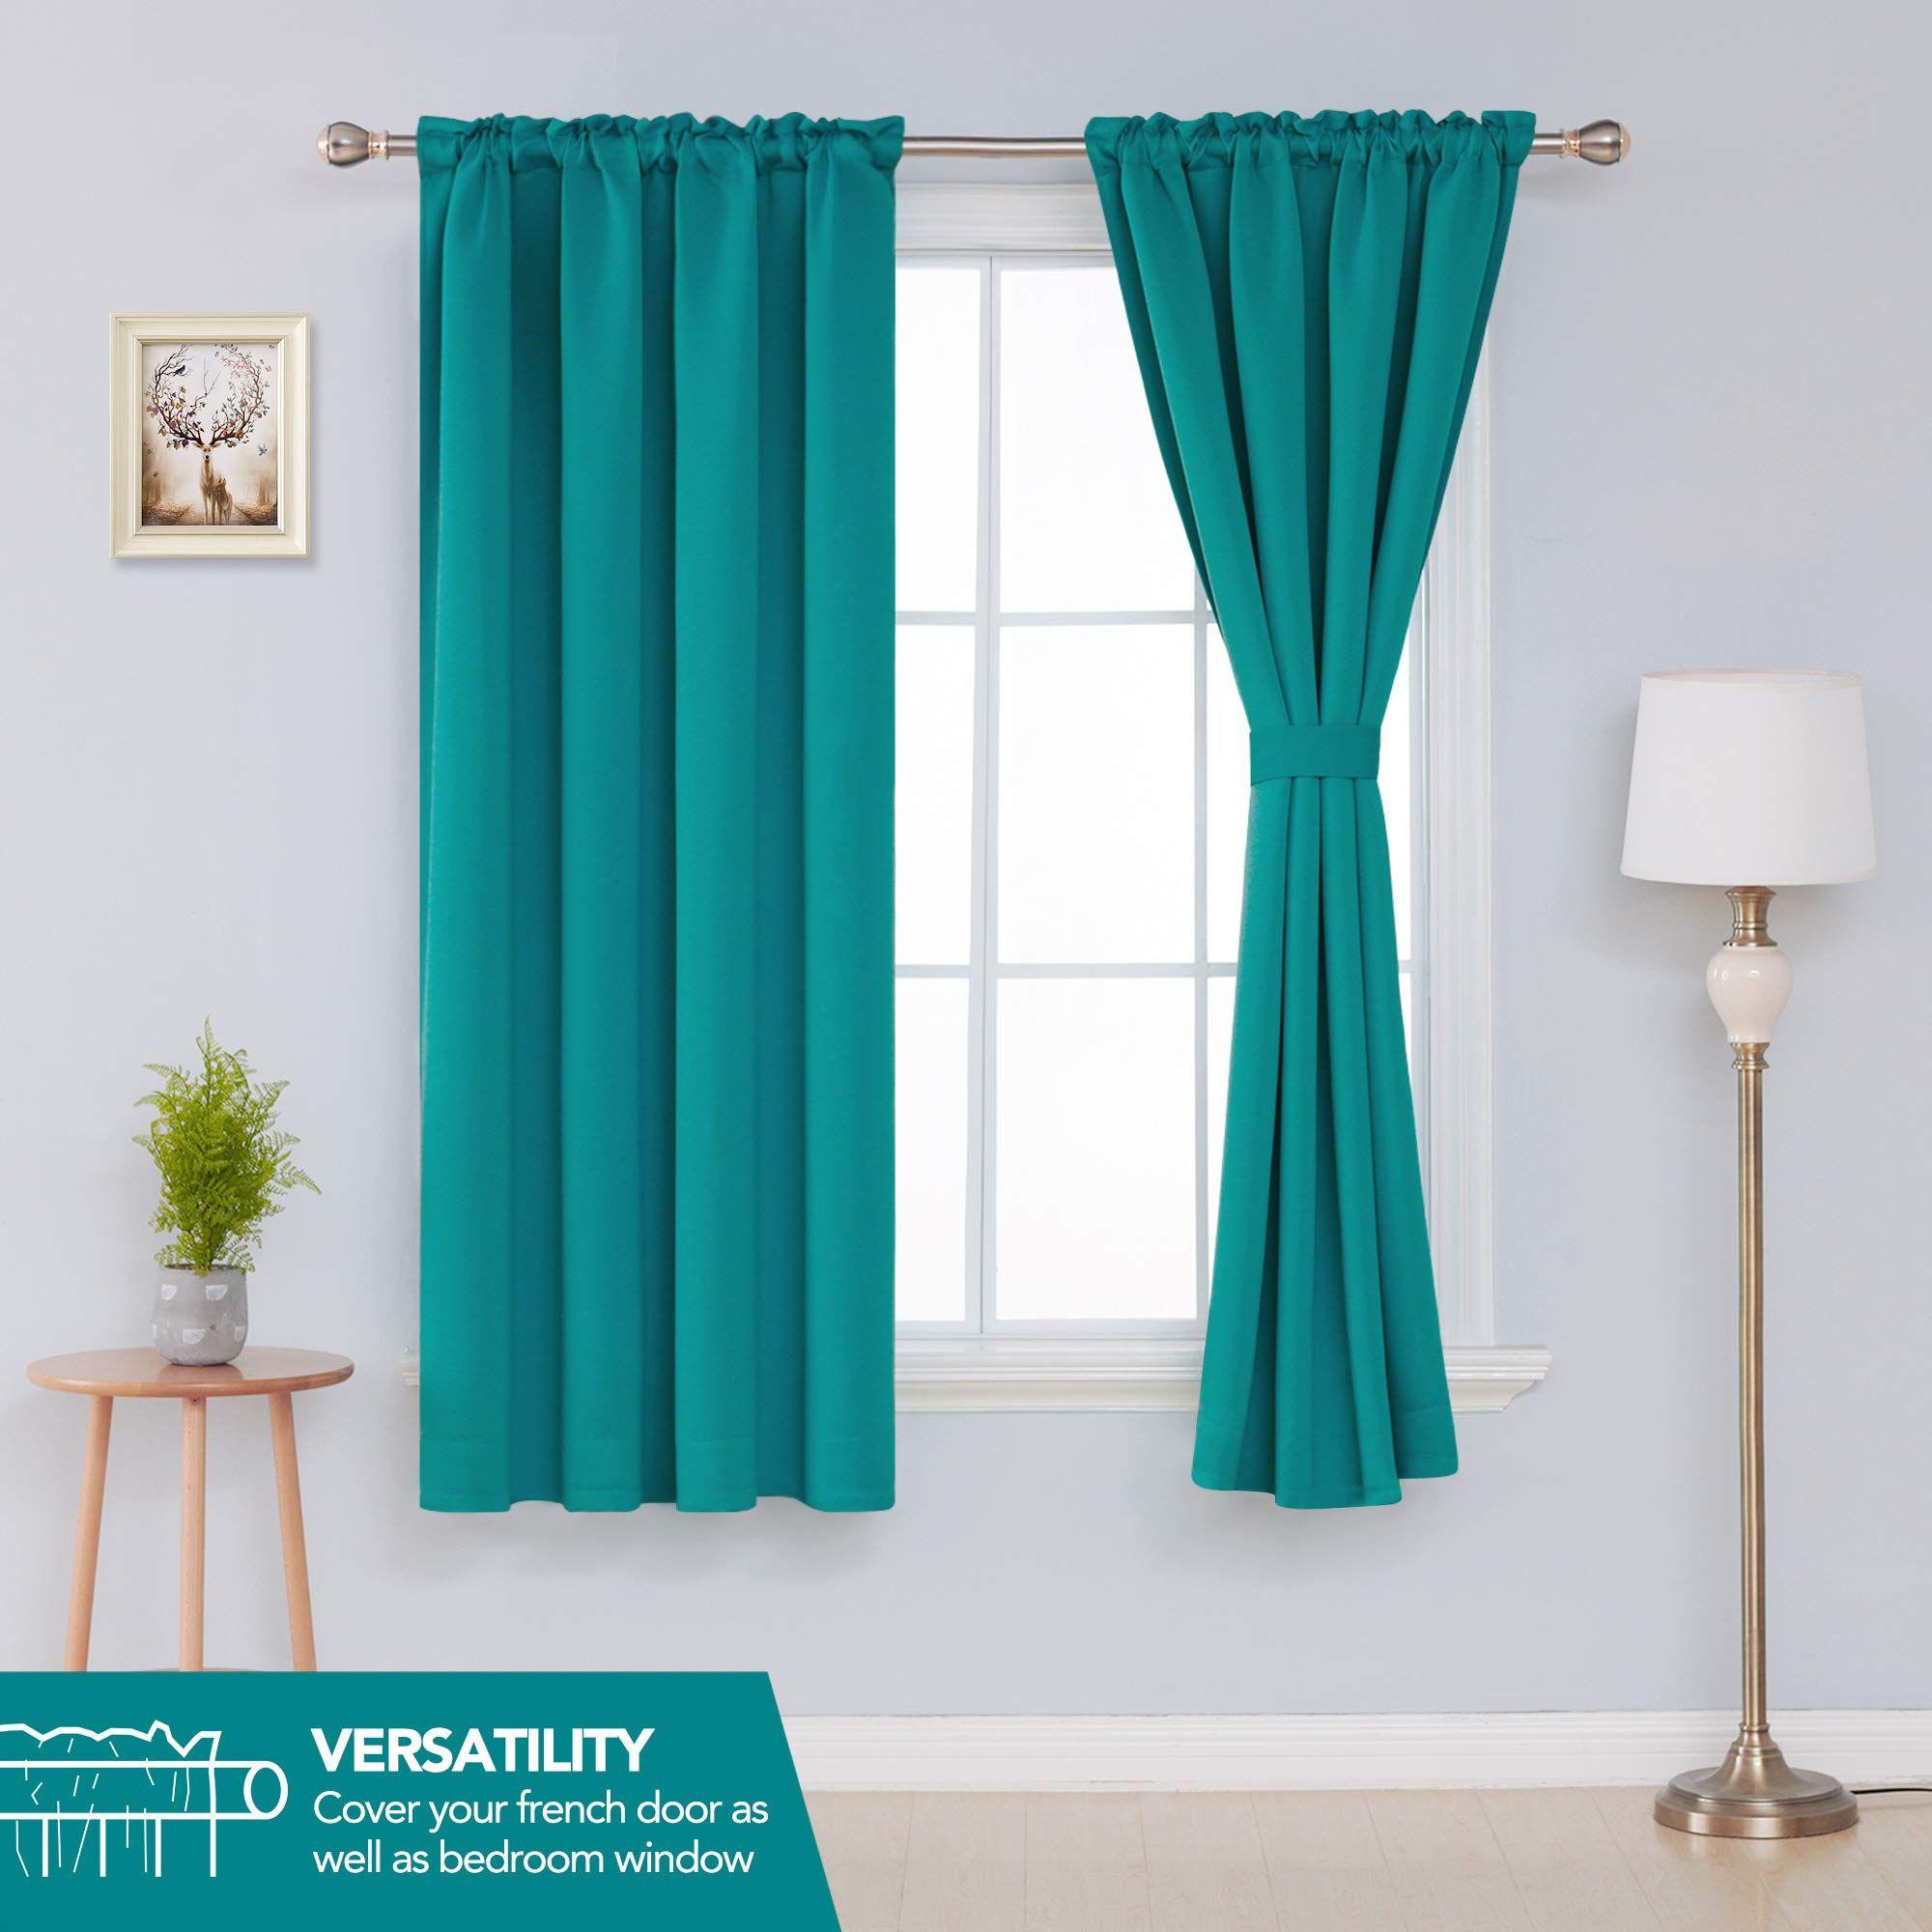 Deconovo Room Darkening Door Blackout Curtains Thermal Insulated